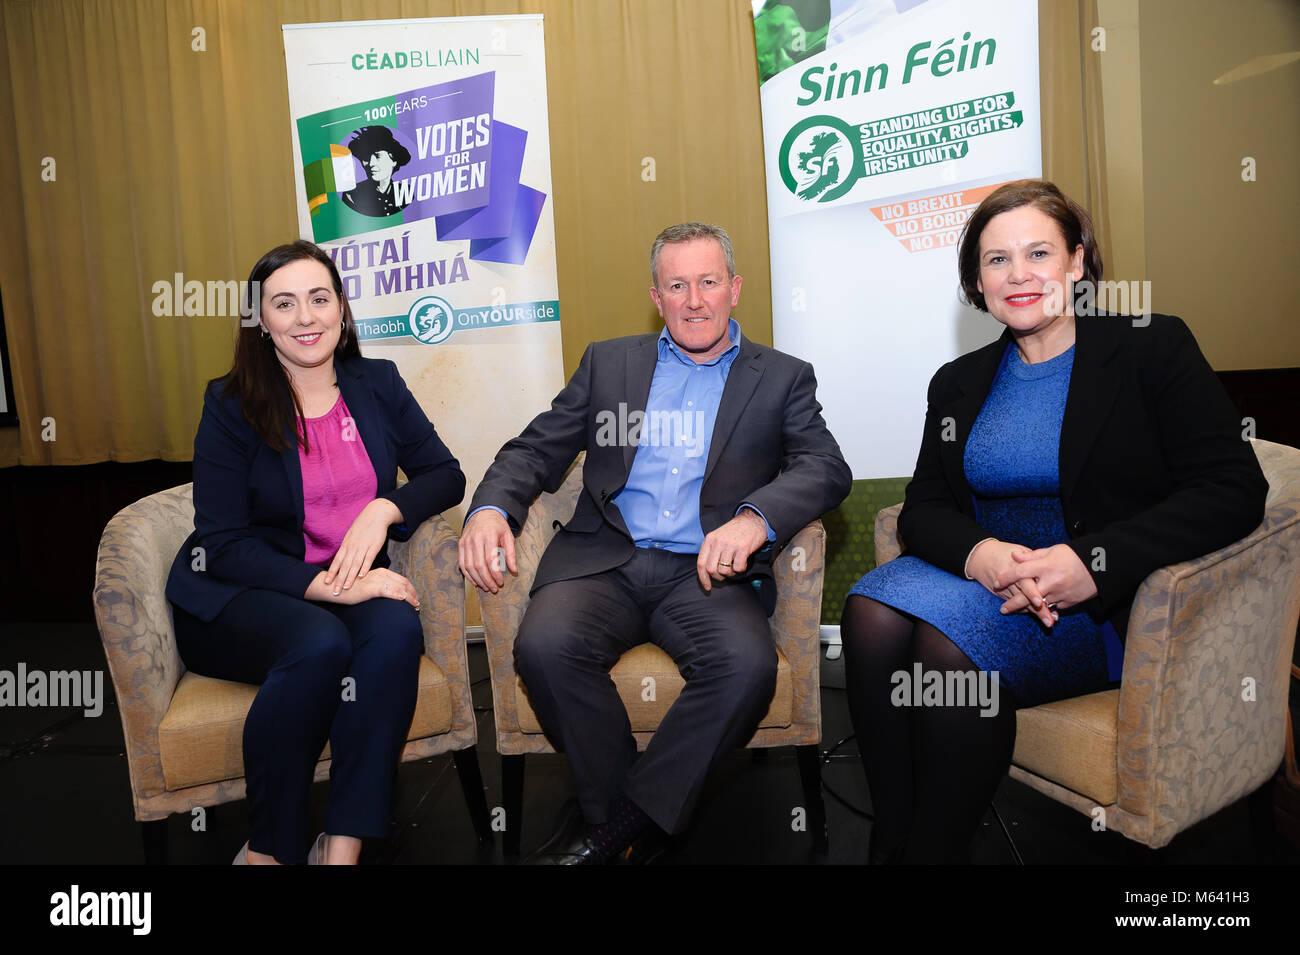 County Armagh, Northern Ireland. 27th Feb, 2018. Megan Fearon MLA, Conor Murphy MLA and Mary Lou McDonald, Sinn - Stock Image